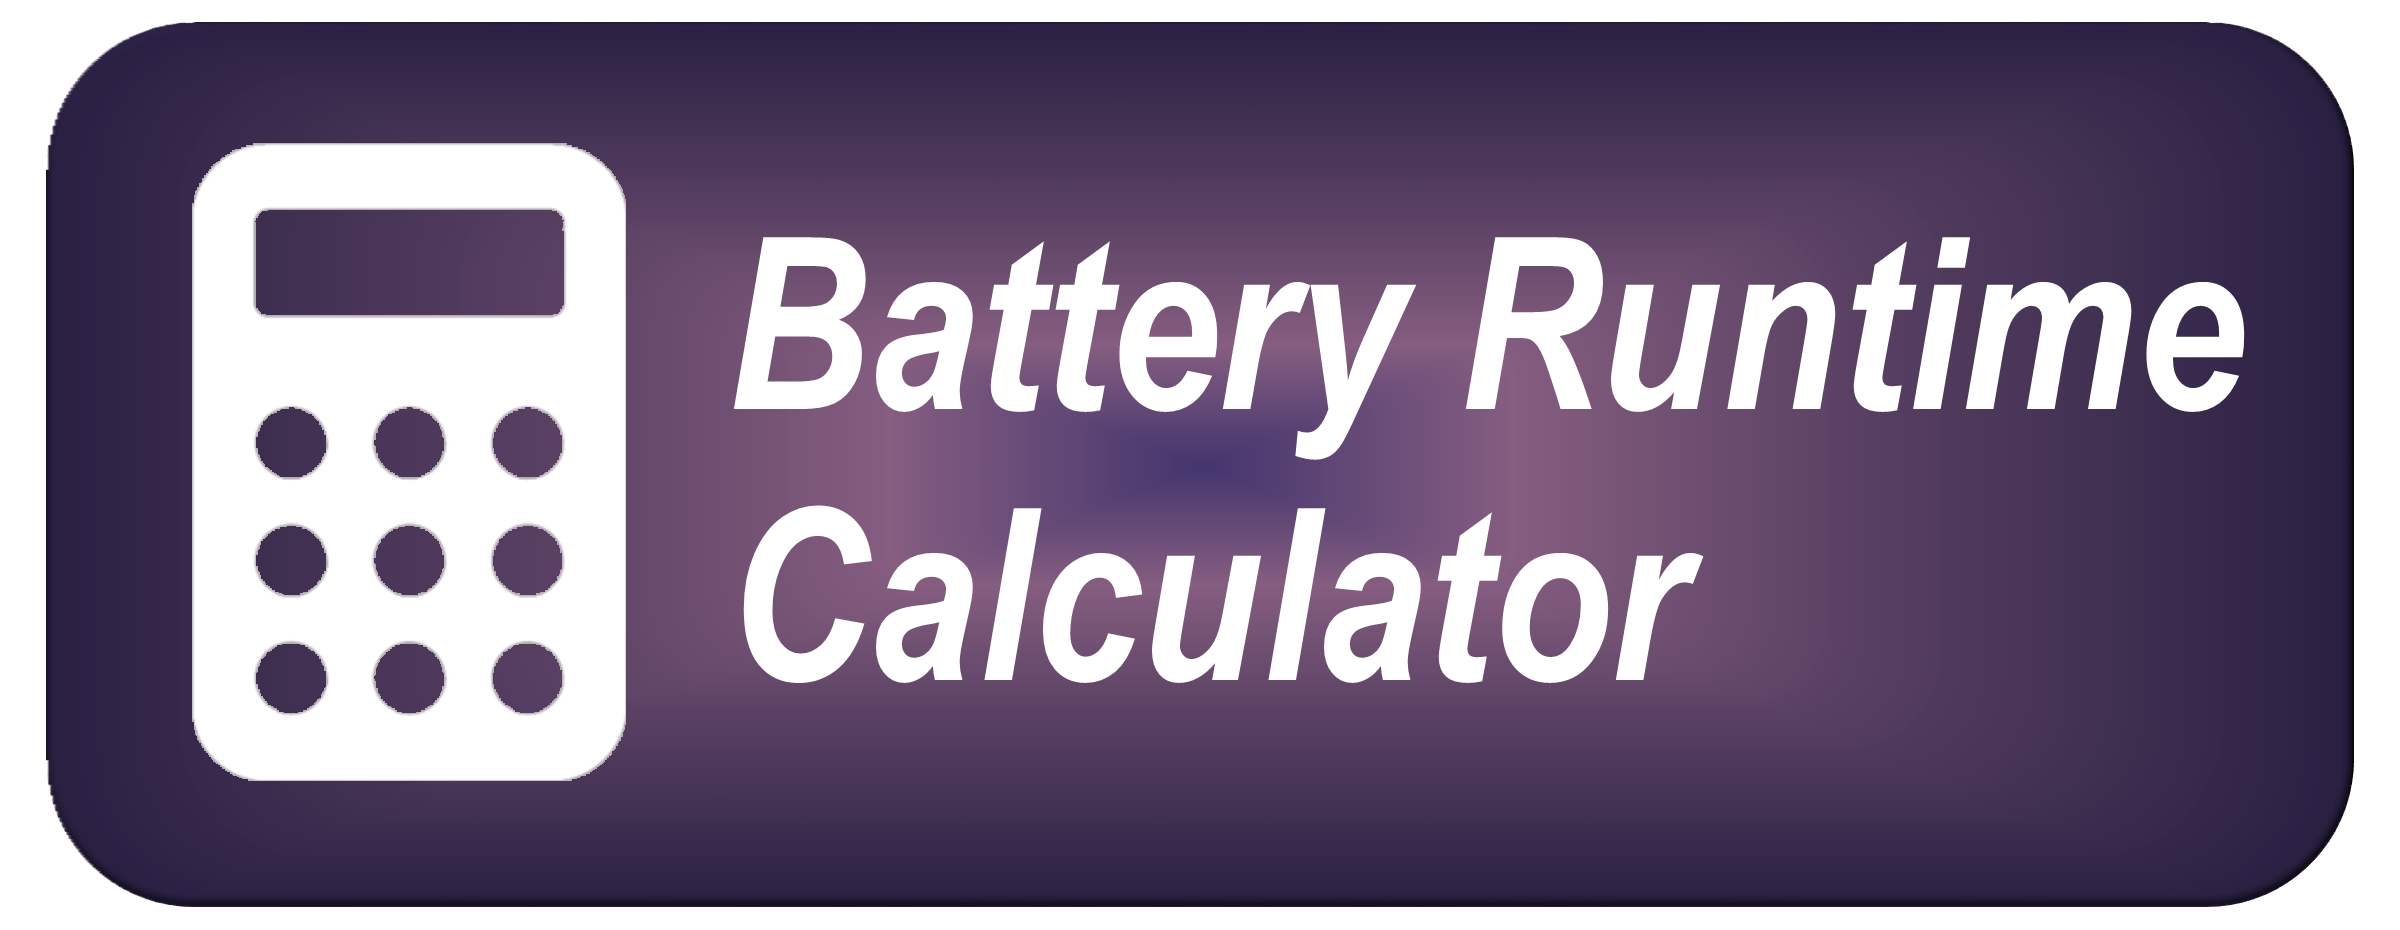 Battery Runtime Calculator